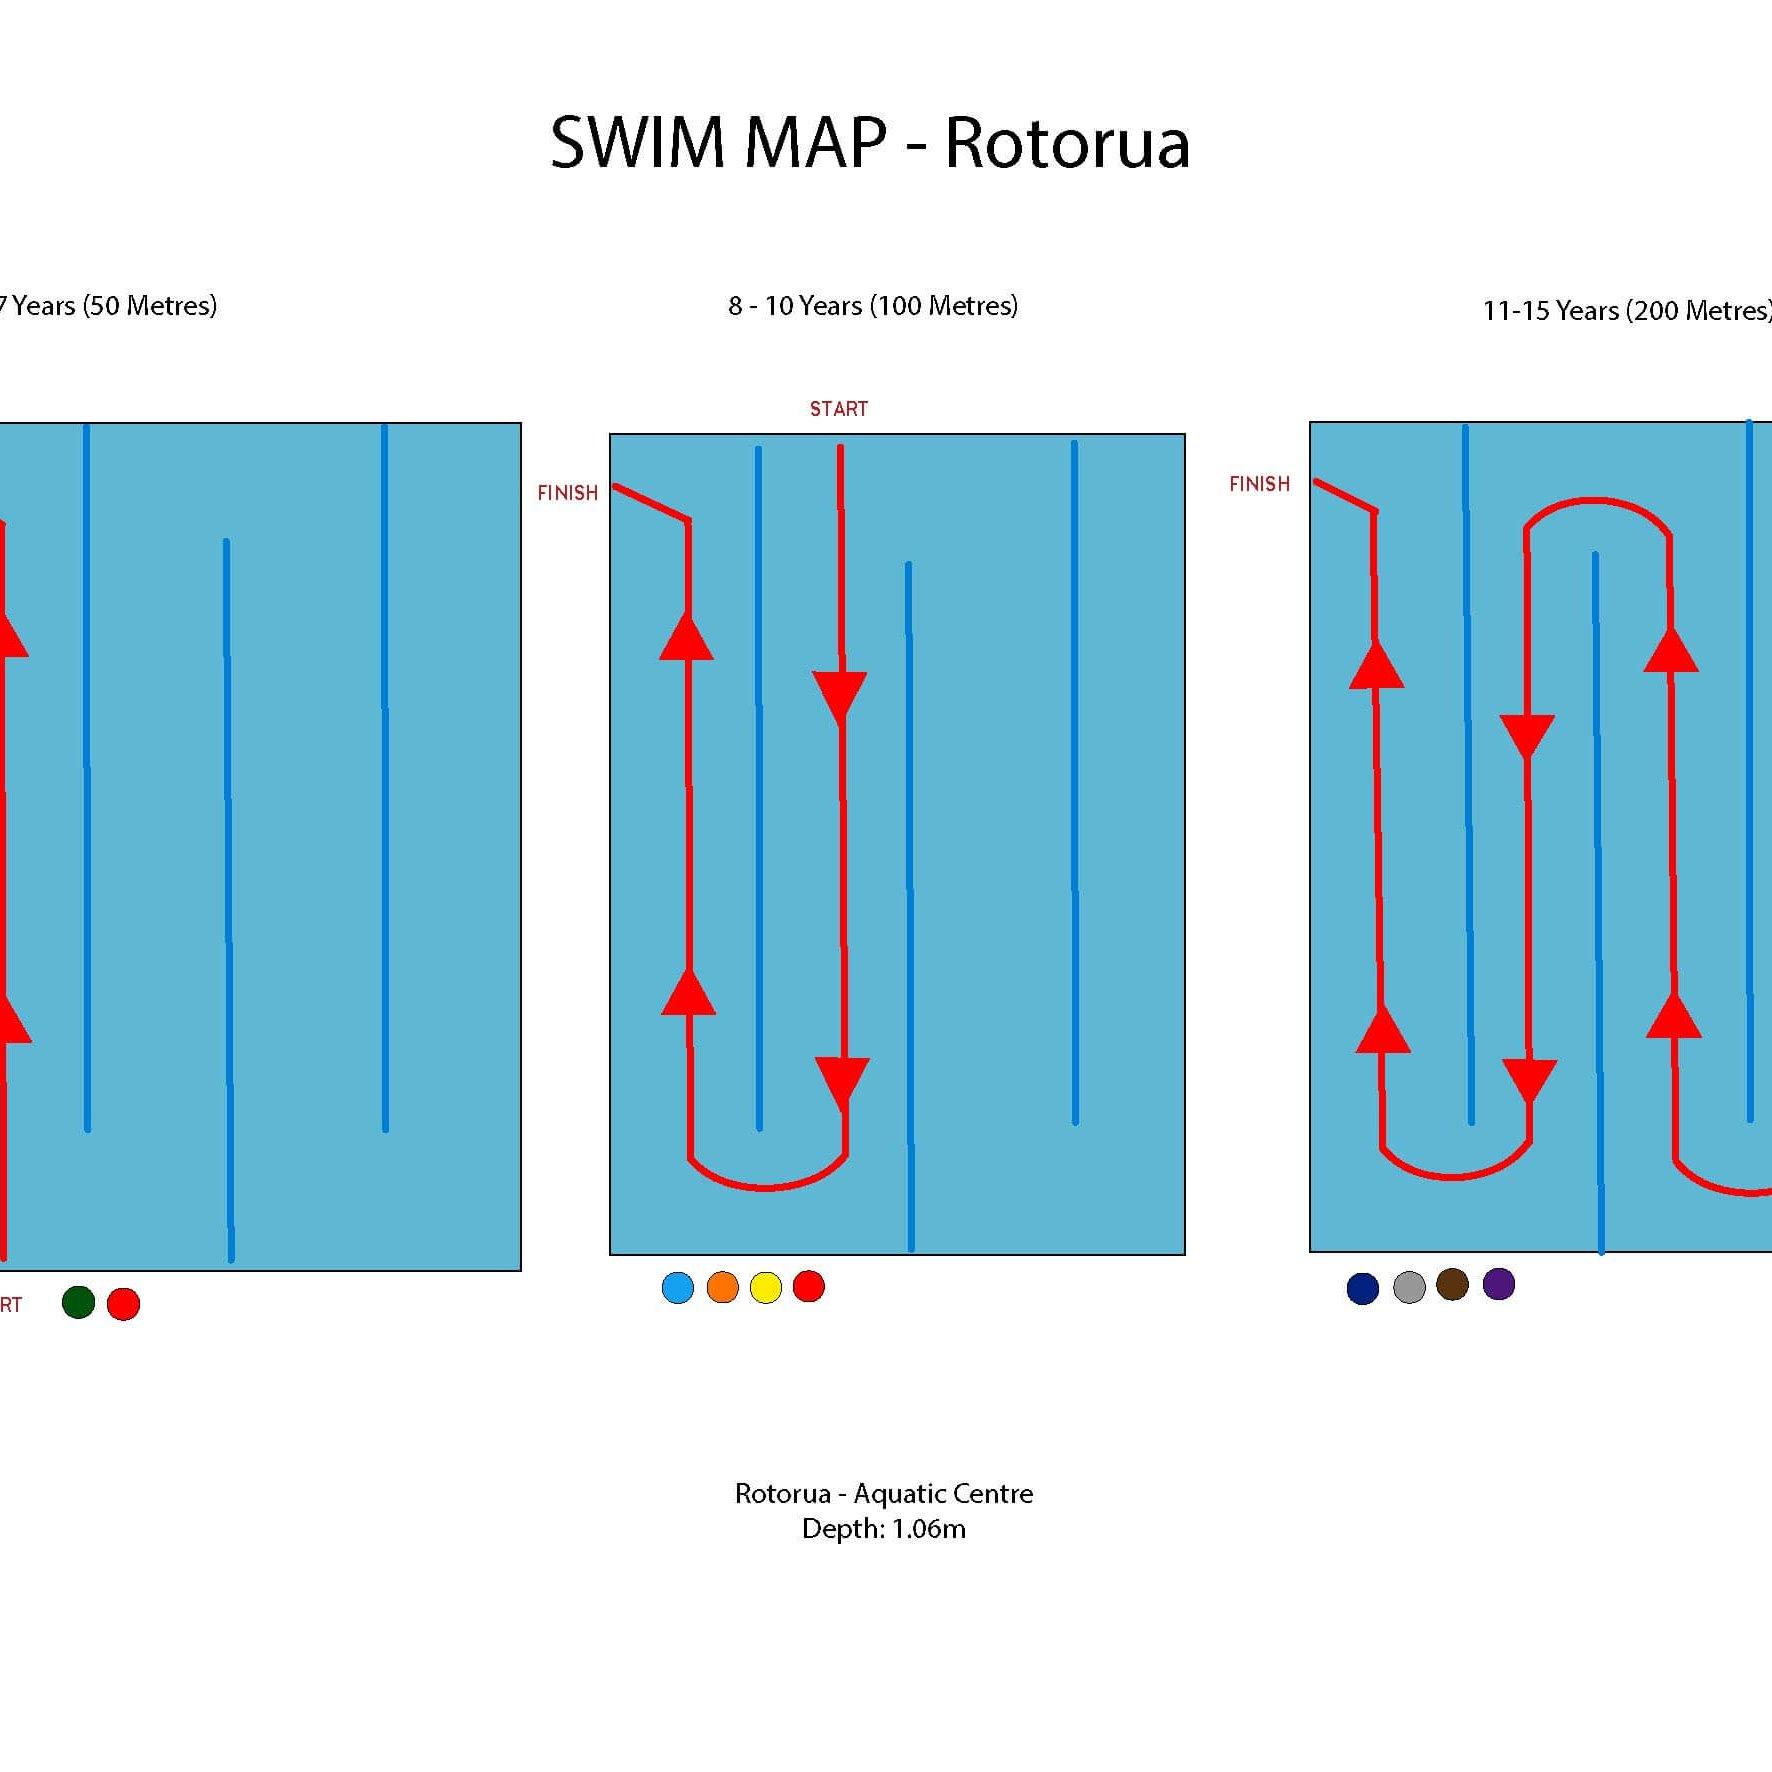 17-18 Rotorua - Swim Map v2